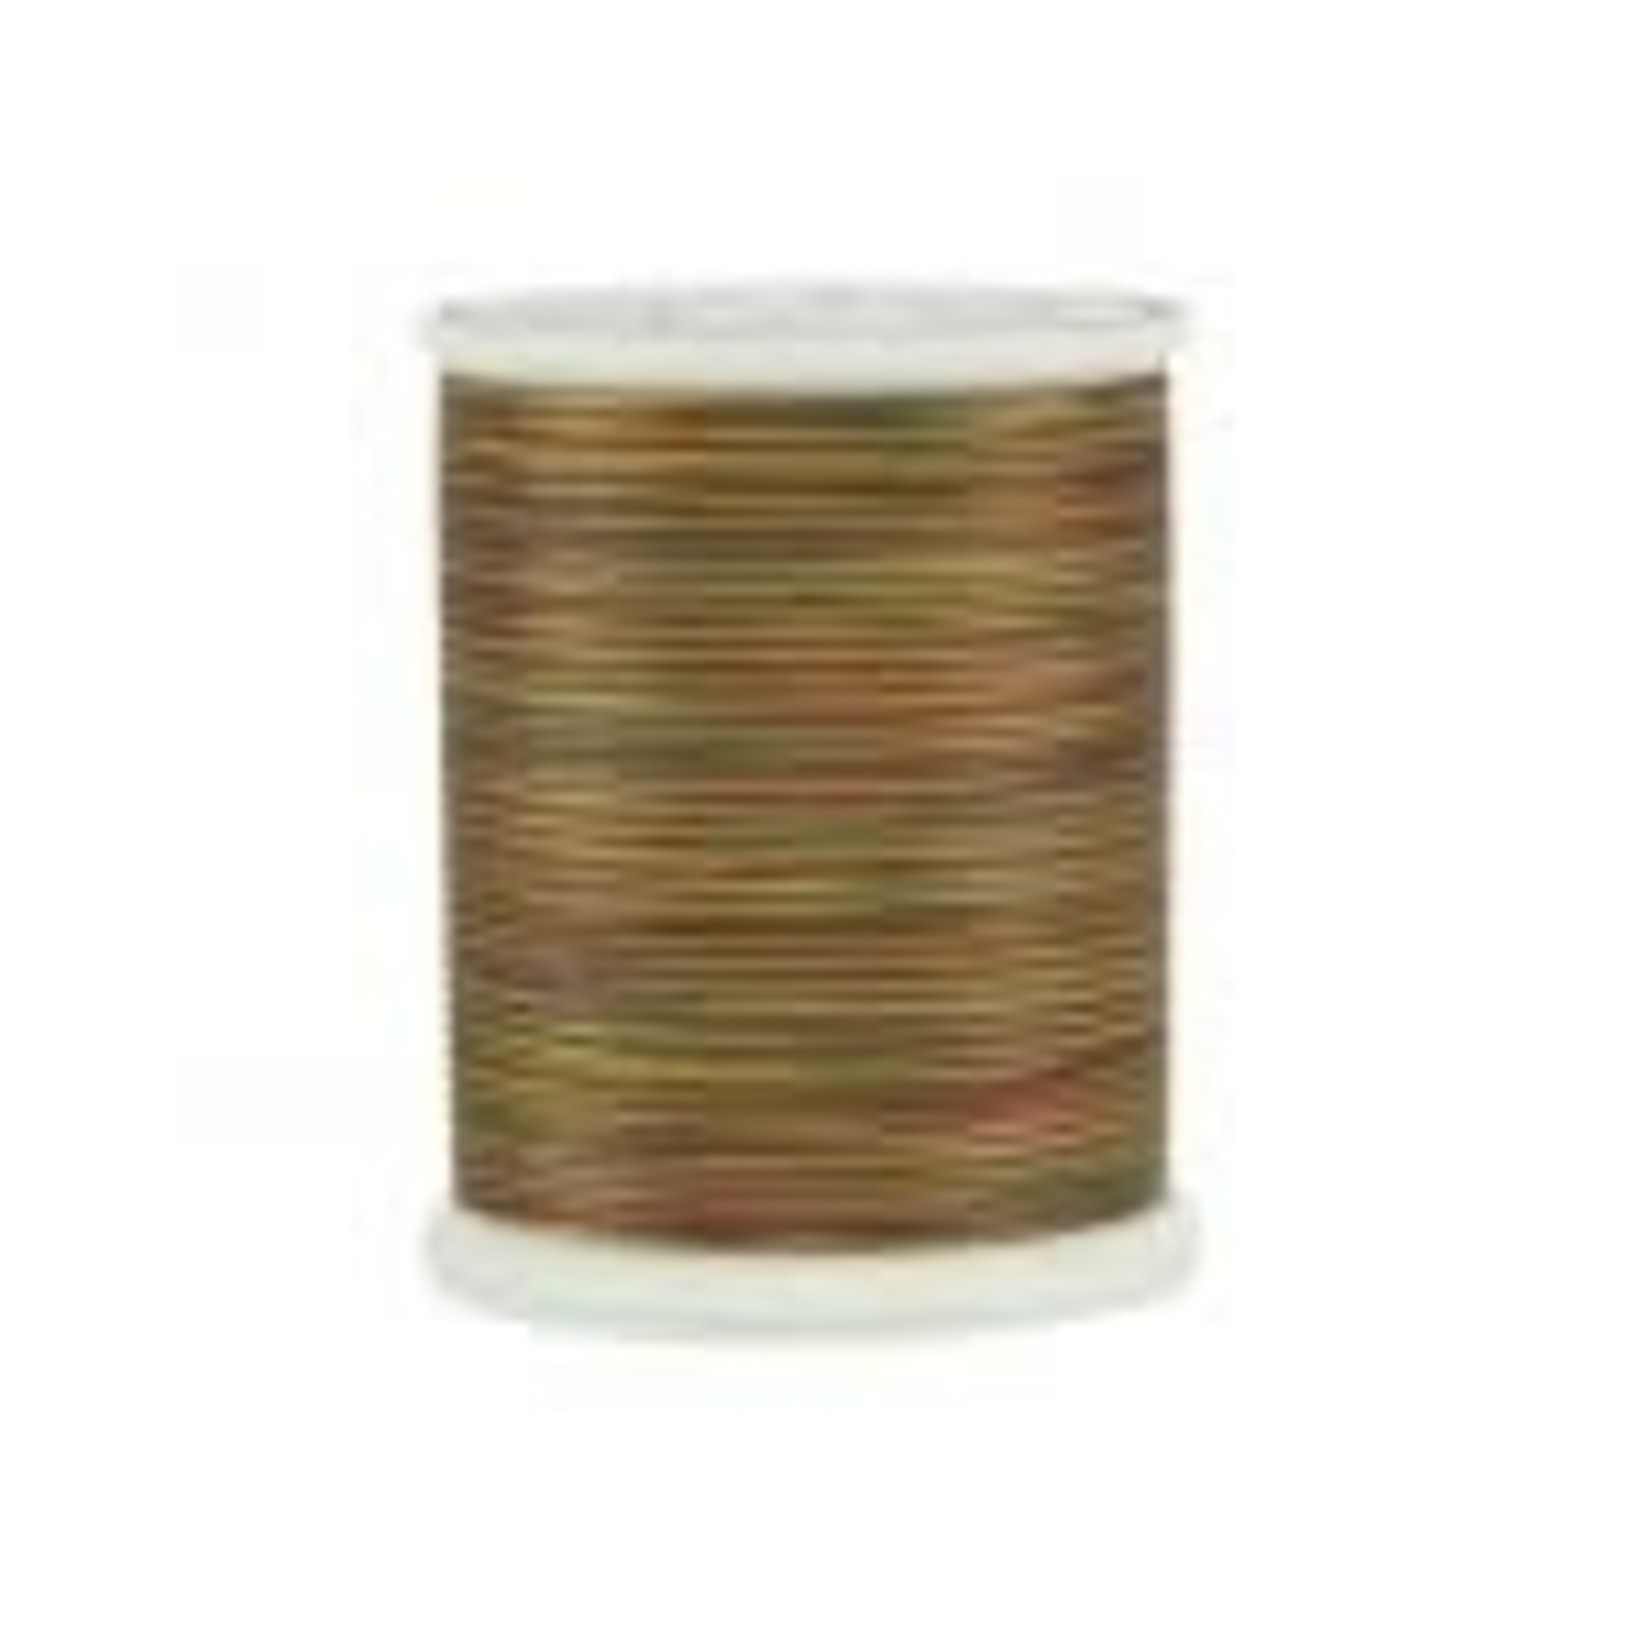 Superior Threads King Tut - #40 - 457 m - 0936 Pharaoh's Treasures